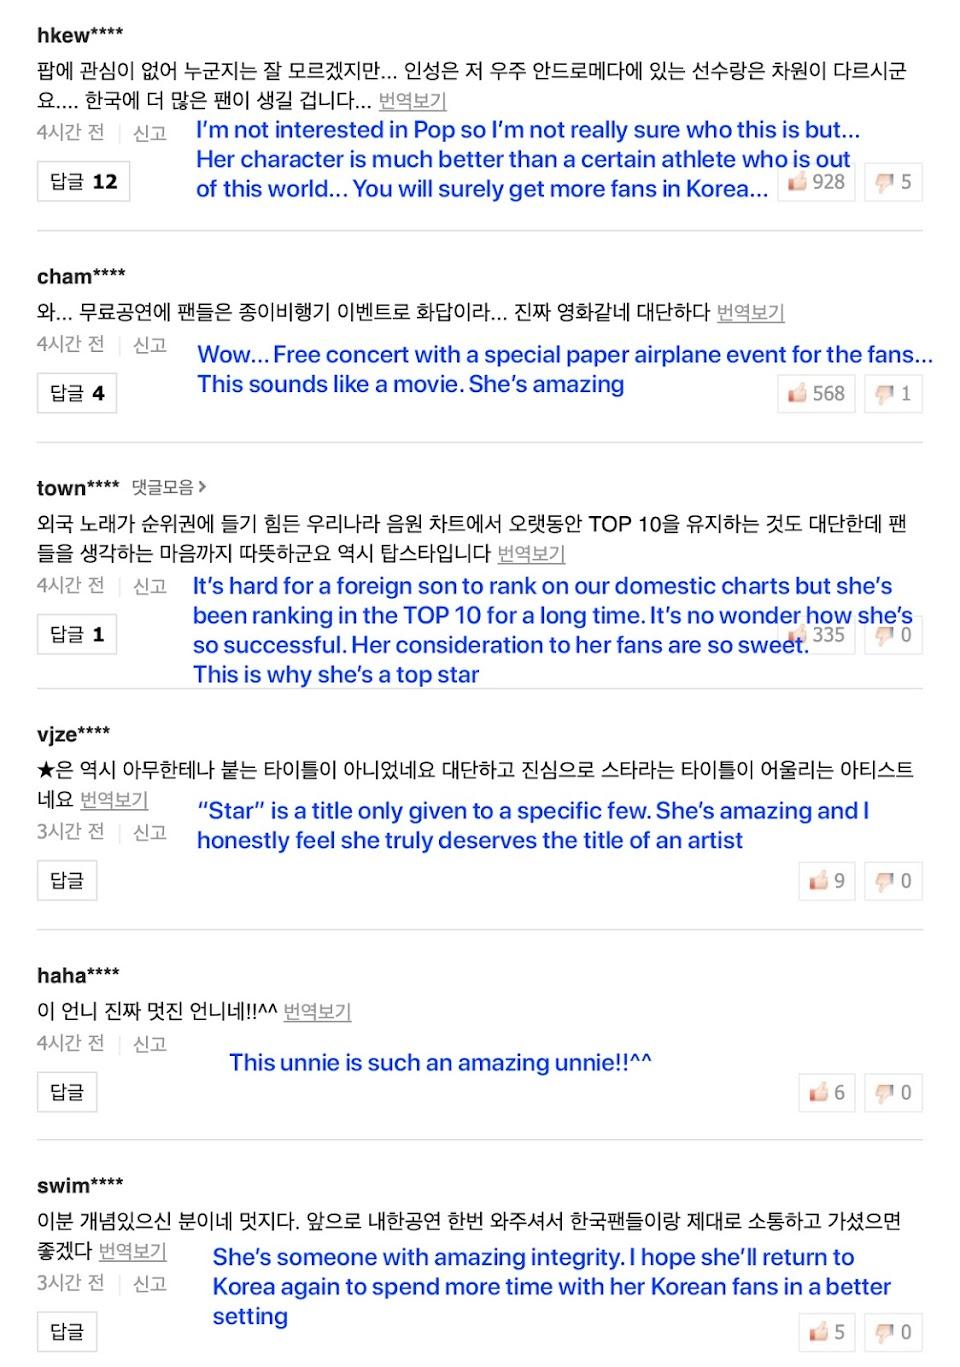 anne marie korea performance cancel